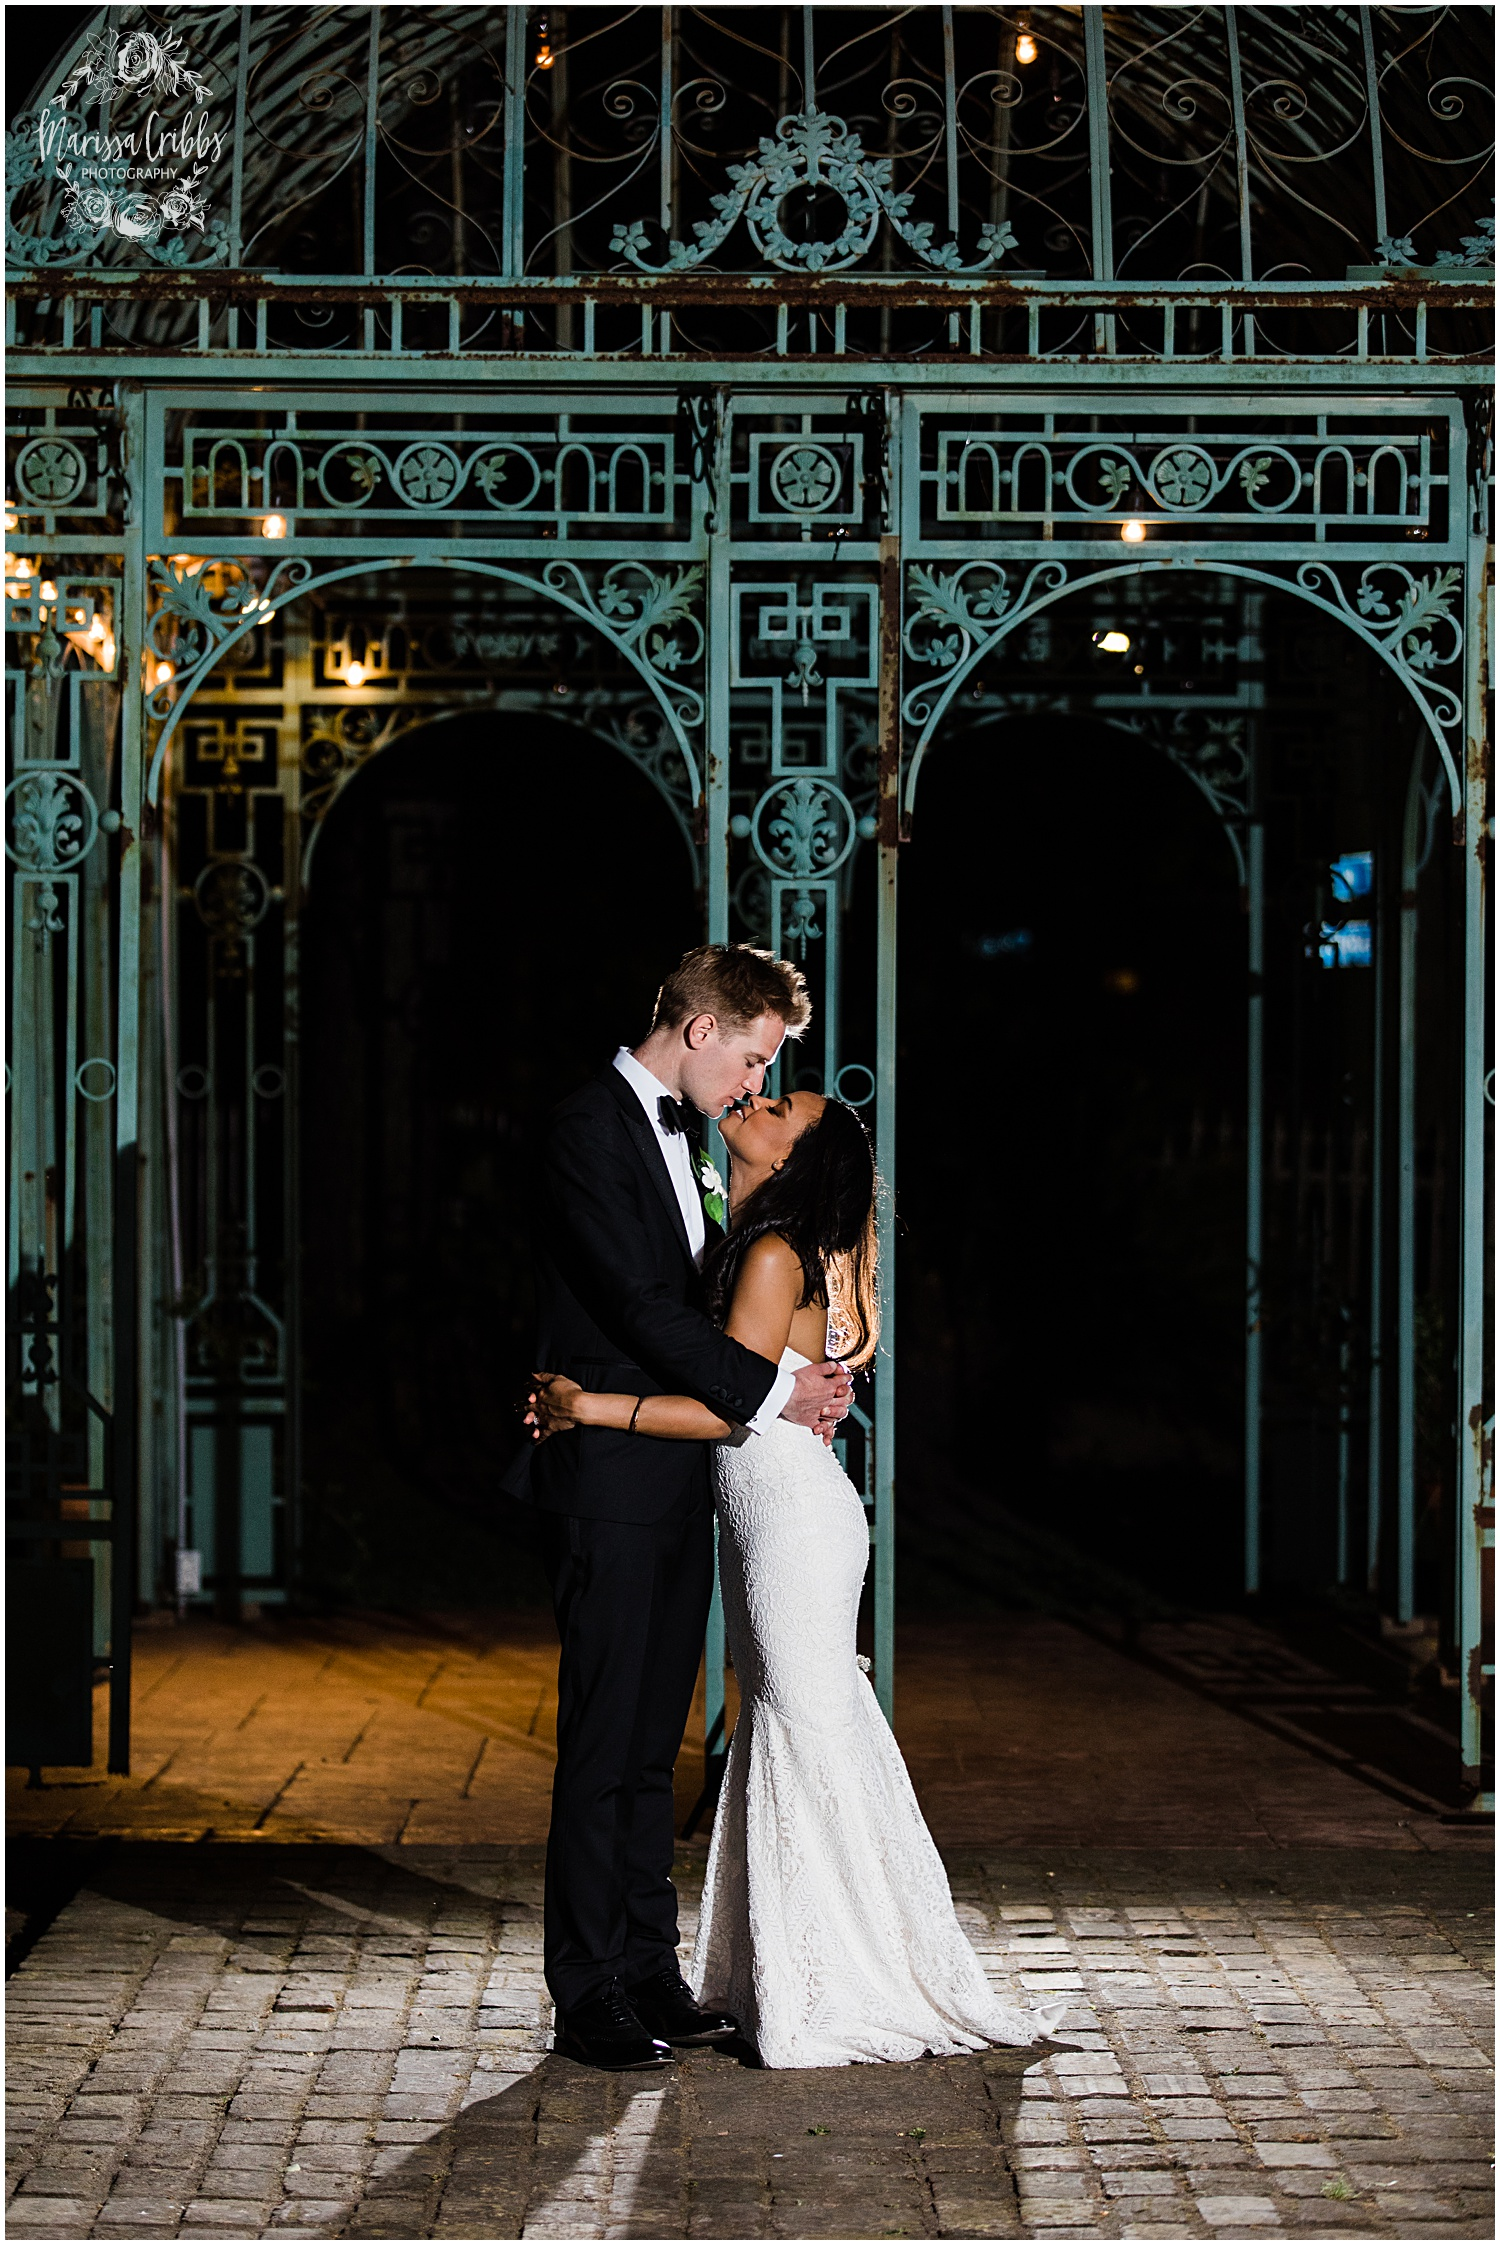 NEW ORLEANS WEDDING   BENACHI HOUSE   SARAH & MICHAEL   MARISSA CRIBBS PHOTOGRAPHY_4525.jpg